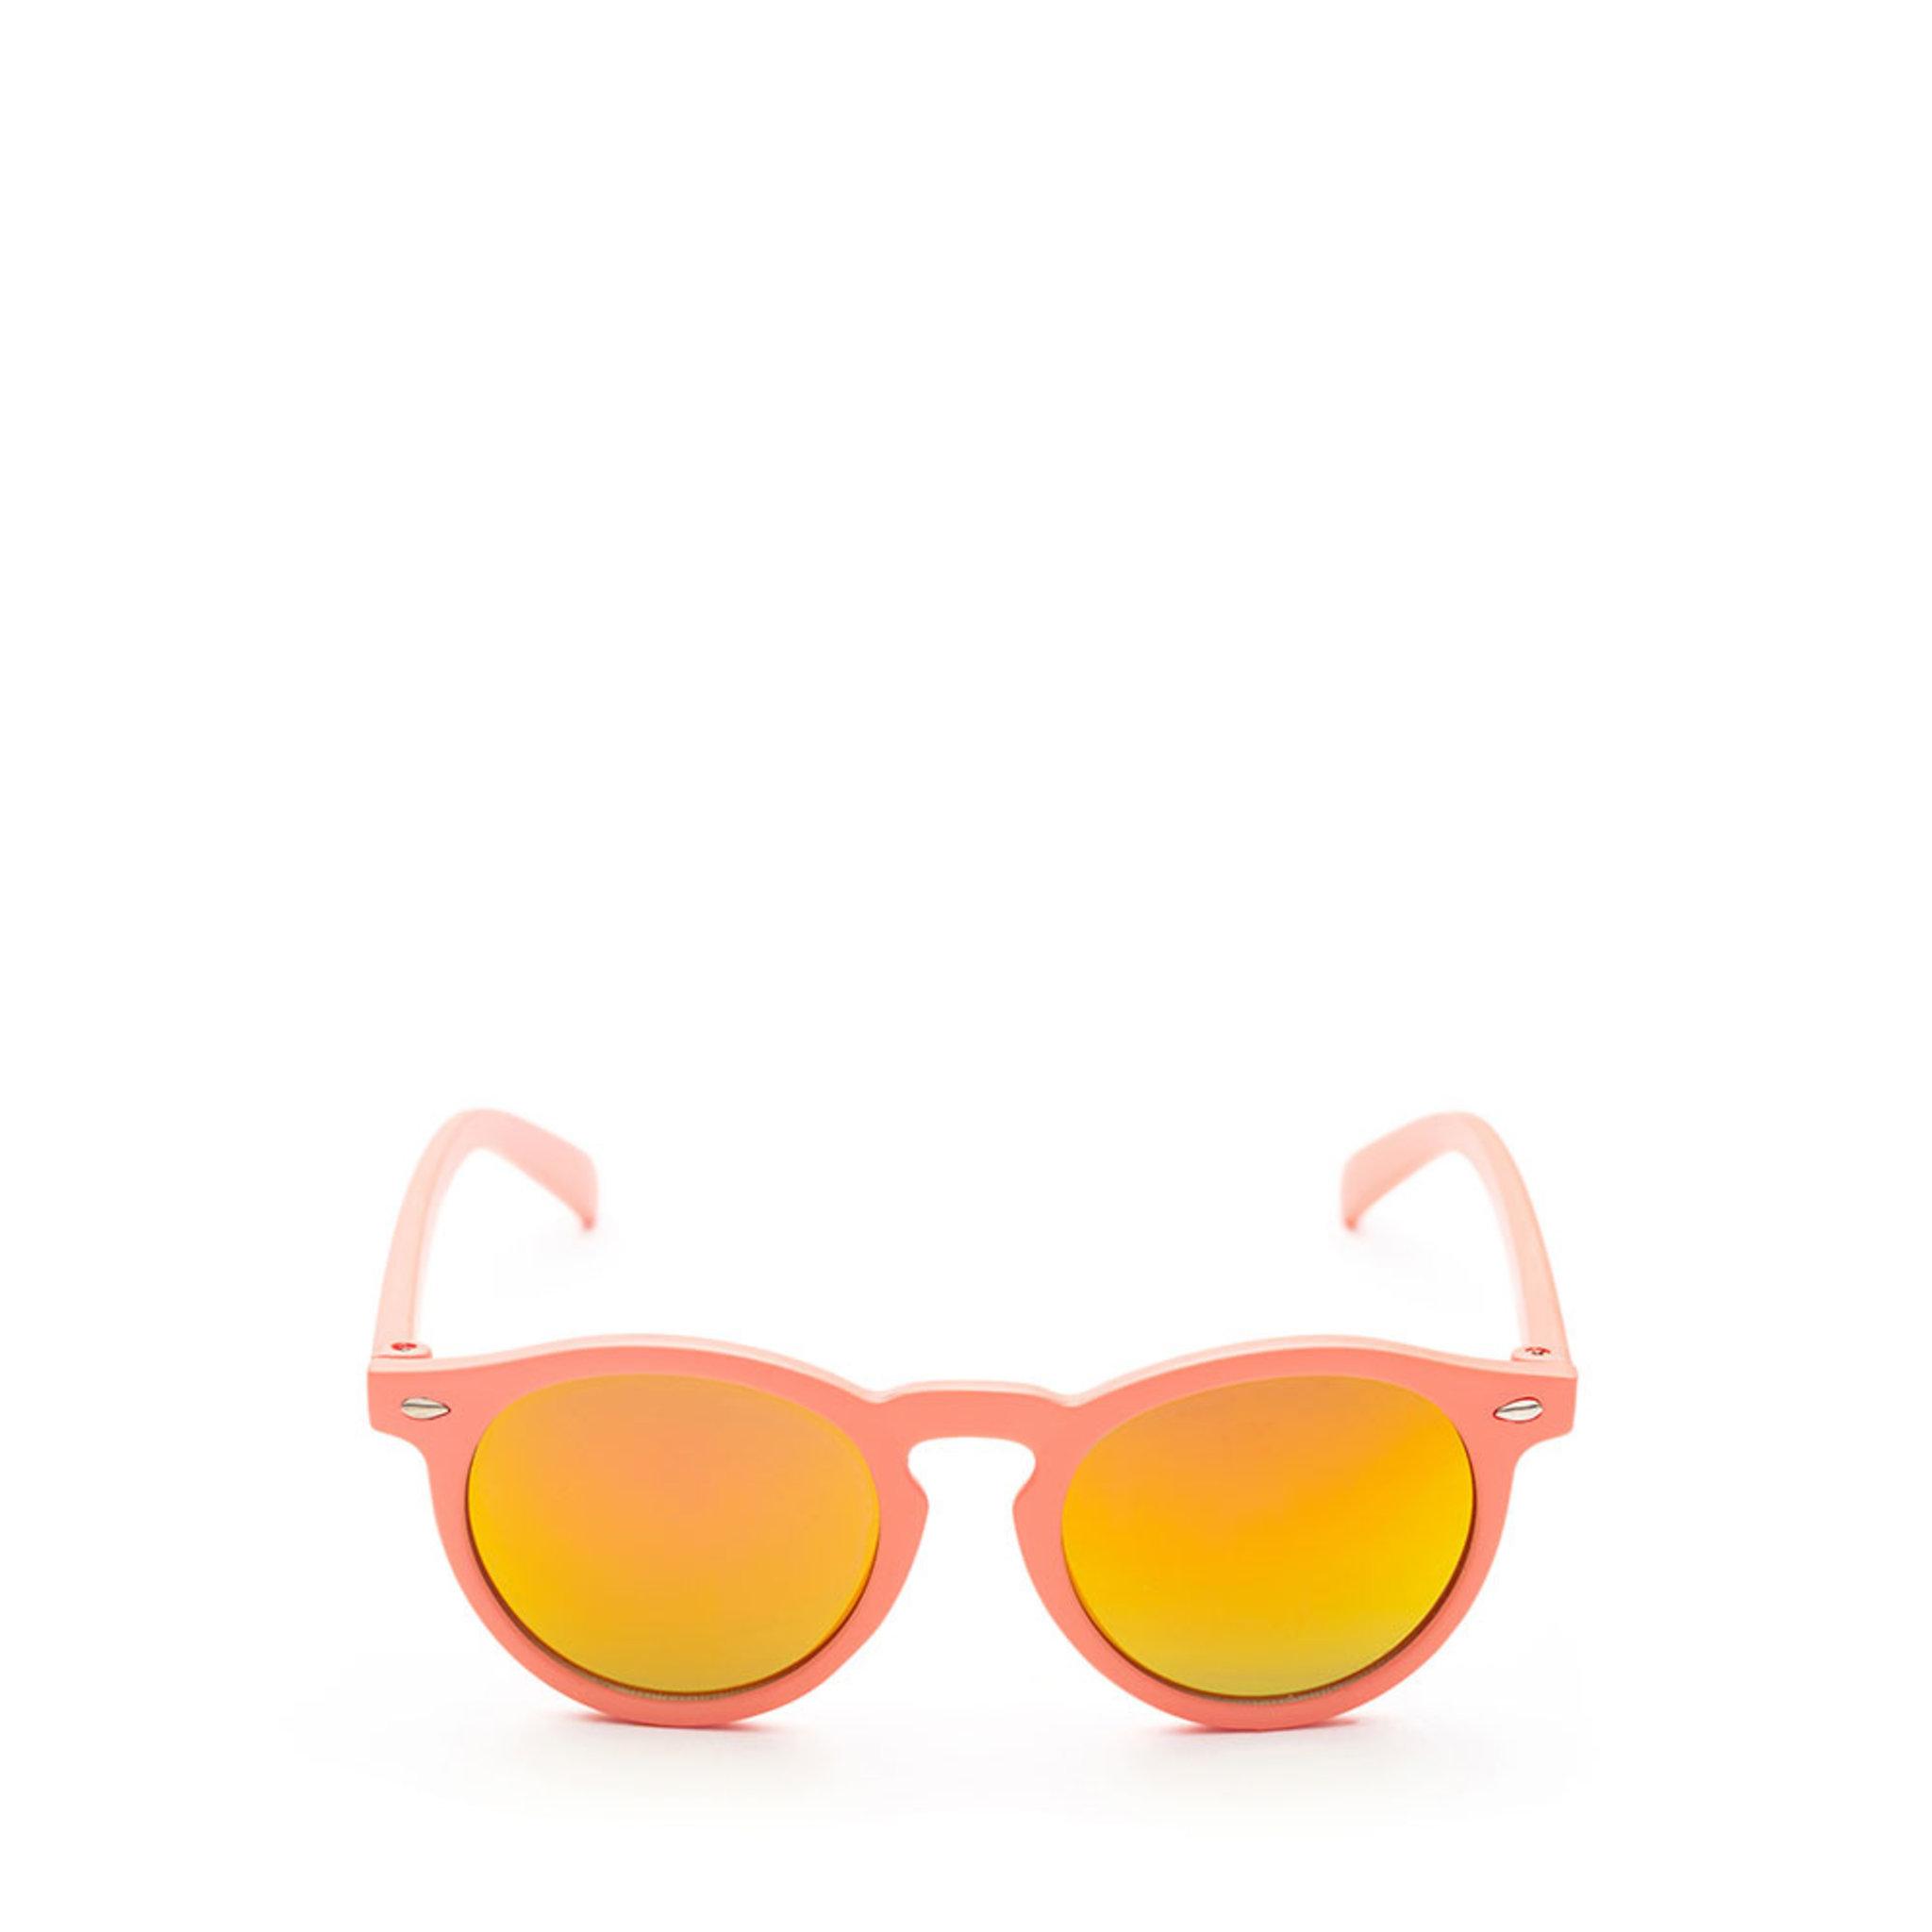 Peach barnsolglasögon